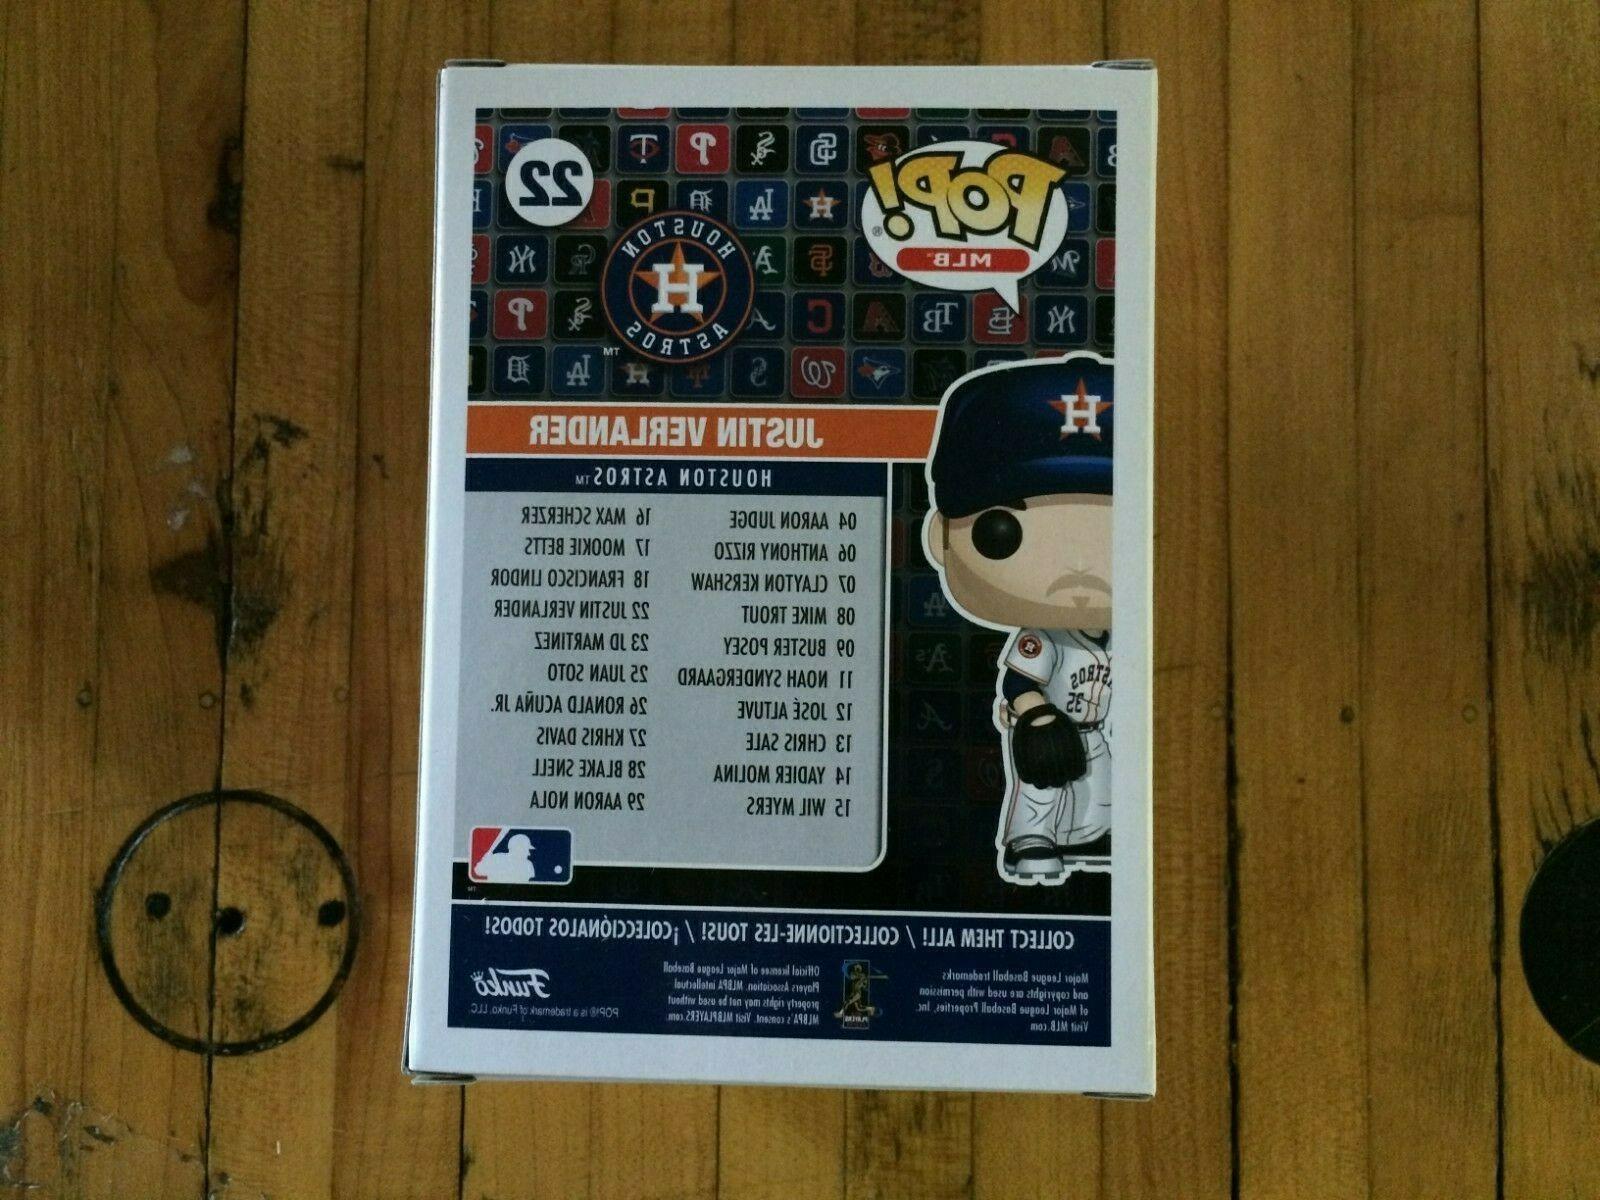 Funko Pop MLB: Baseball - Houston Astros Justin Verlander #22 In